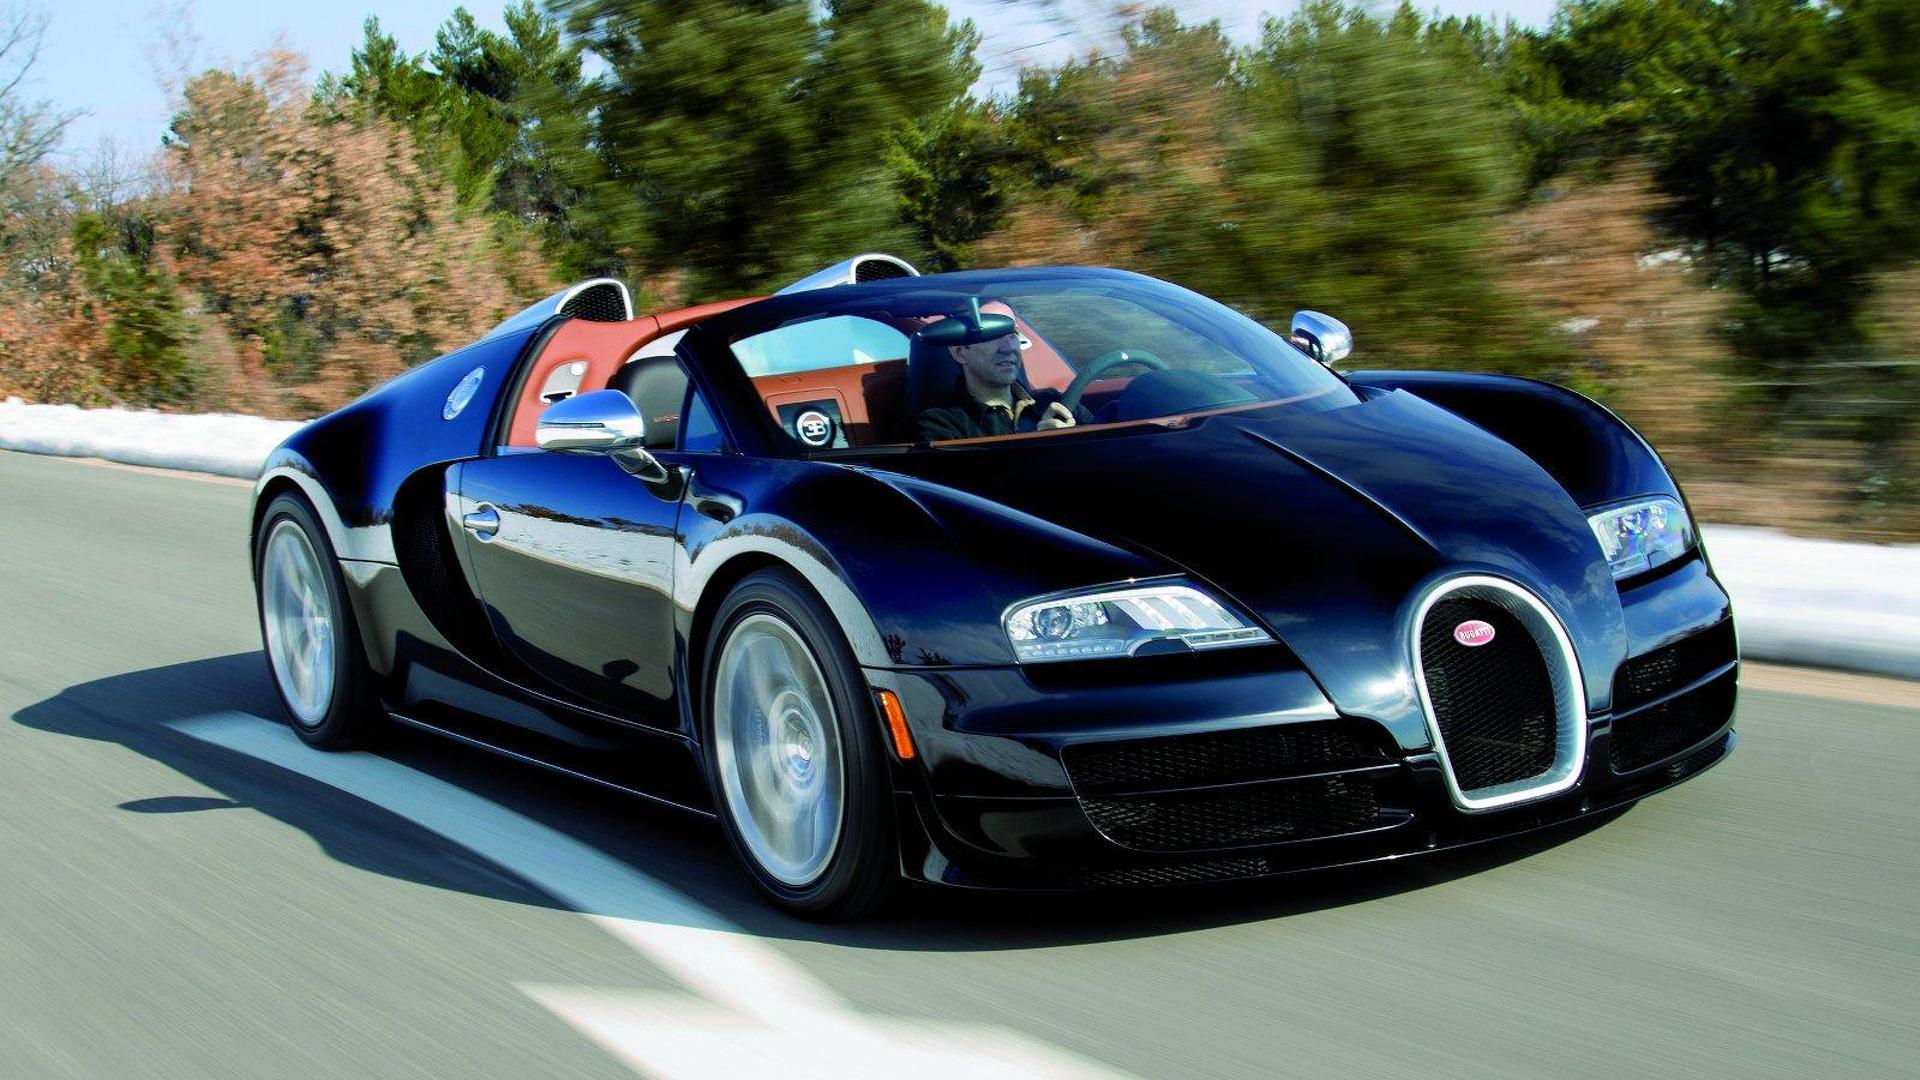 Bugatti Veyron Grand Sport Vitesse revealed with 1,200 HP